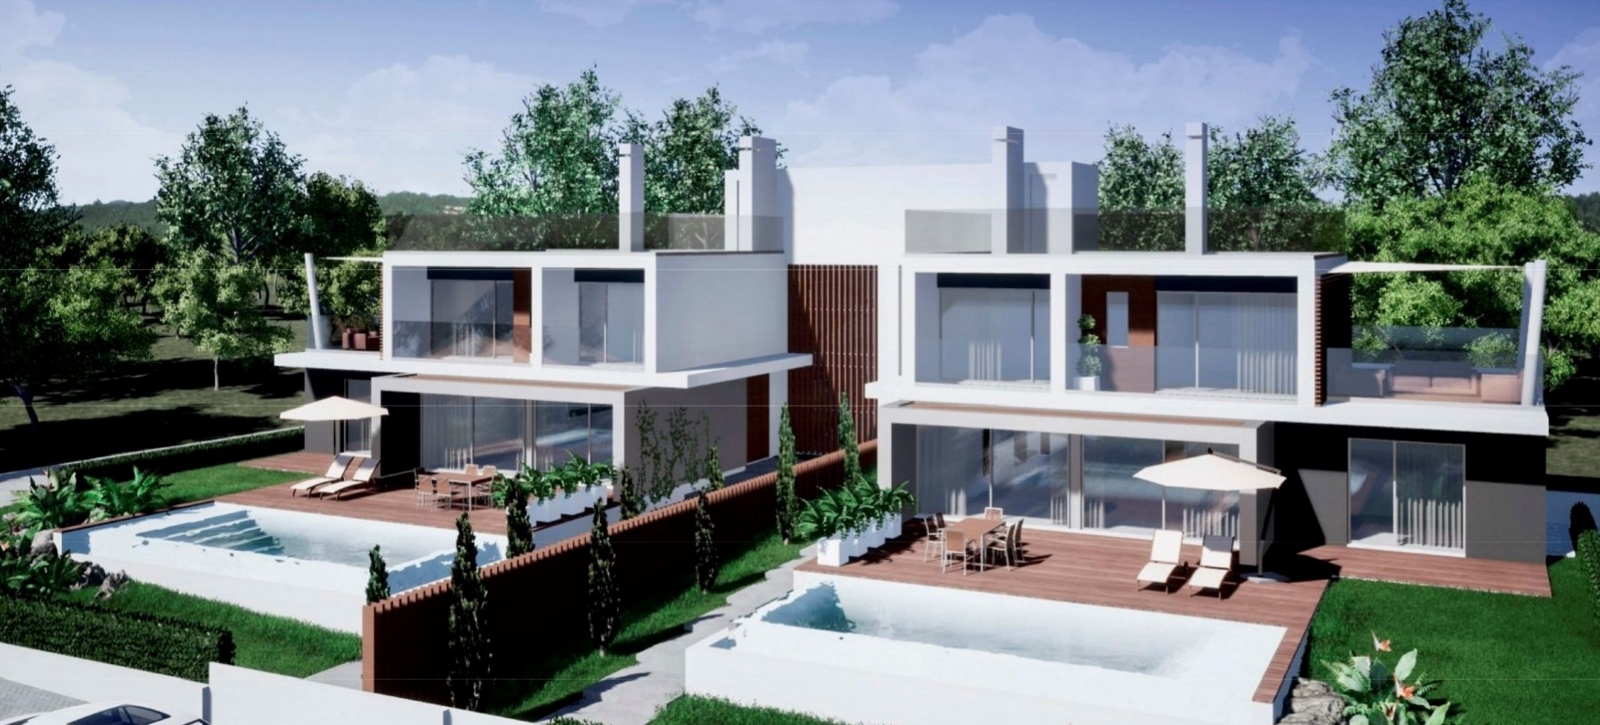 contemporary-4-bedroom-villa-in-the-design-phase-almancil